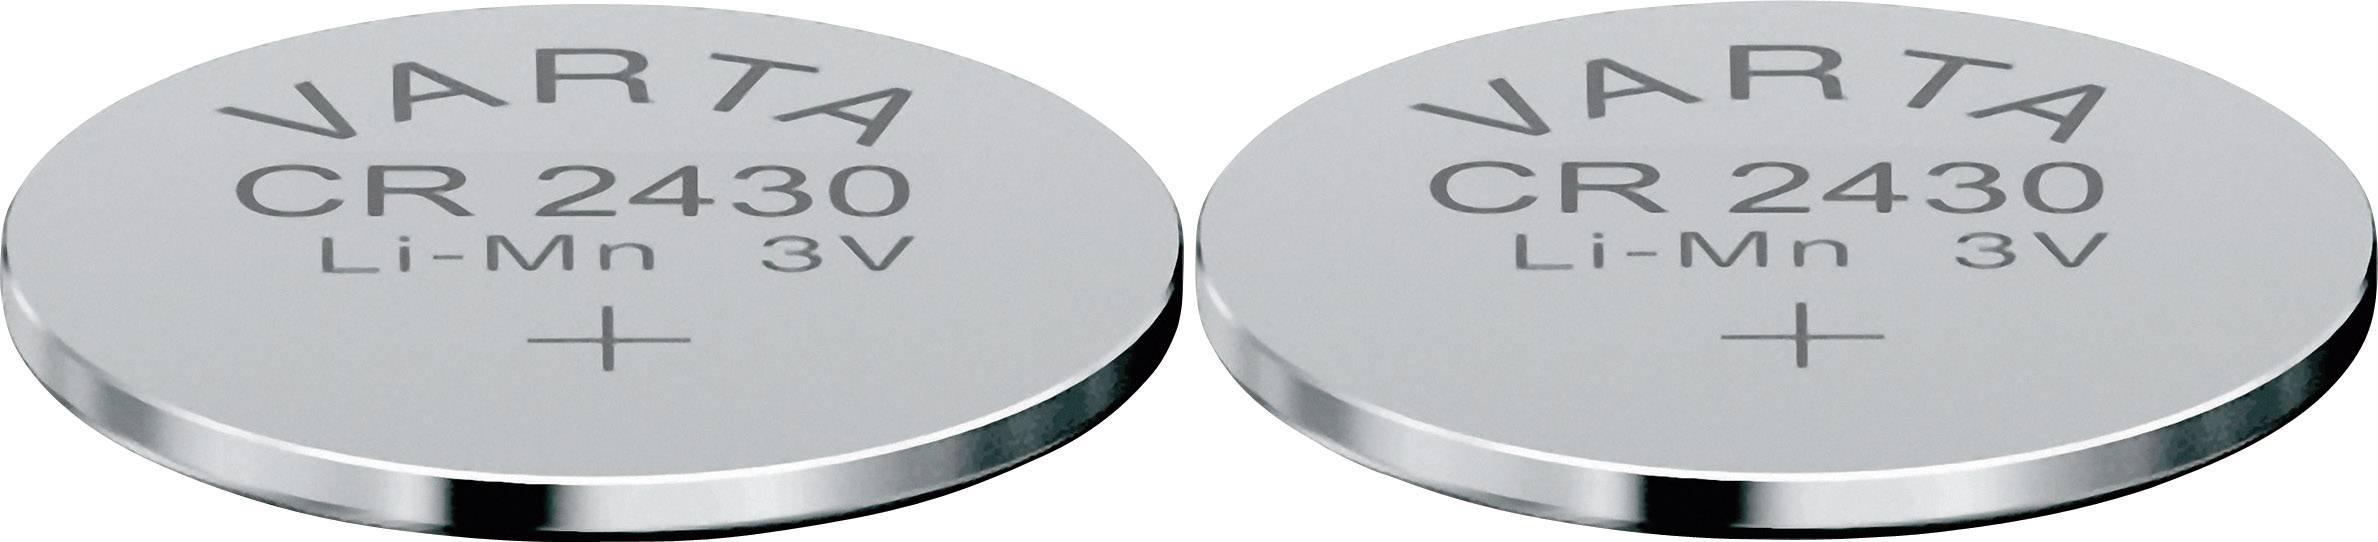 Gombíková batéria Varta CR2430, lítium, 2 ks, 6430101402